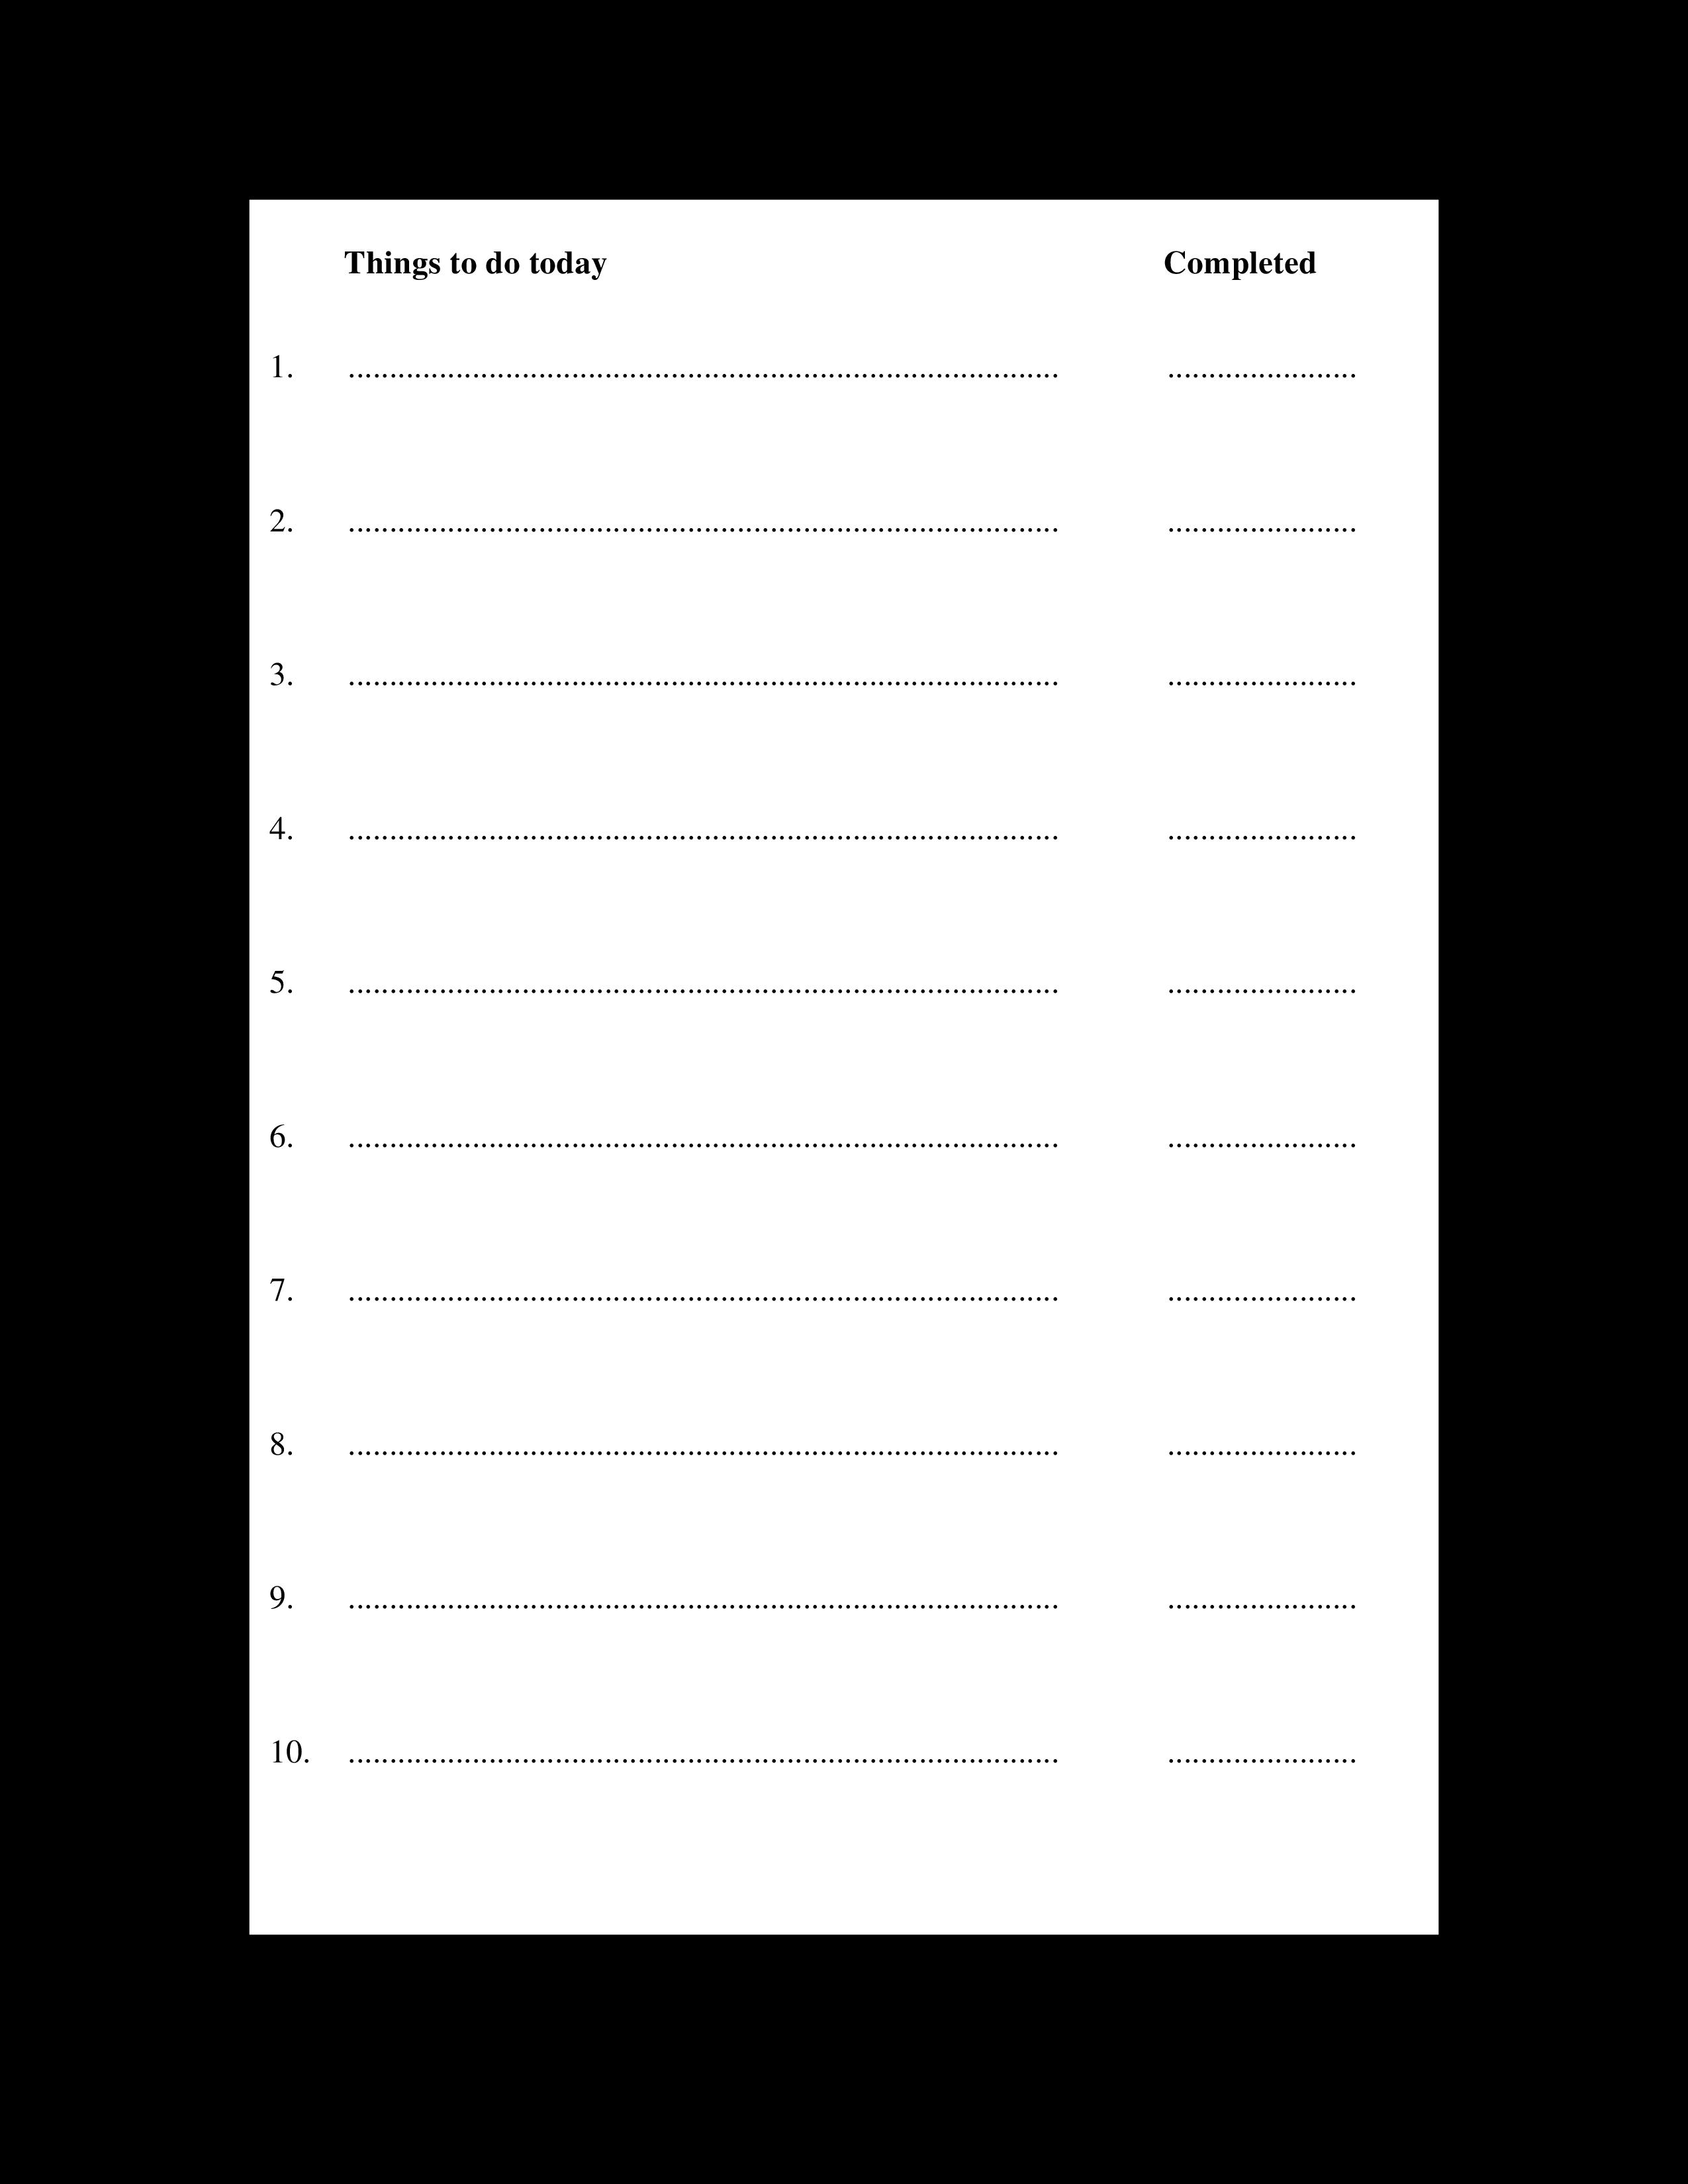 Free Sample Day Planner | Templates at allbusinesstemplates.com